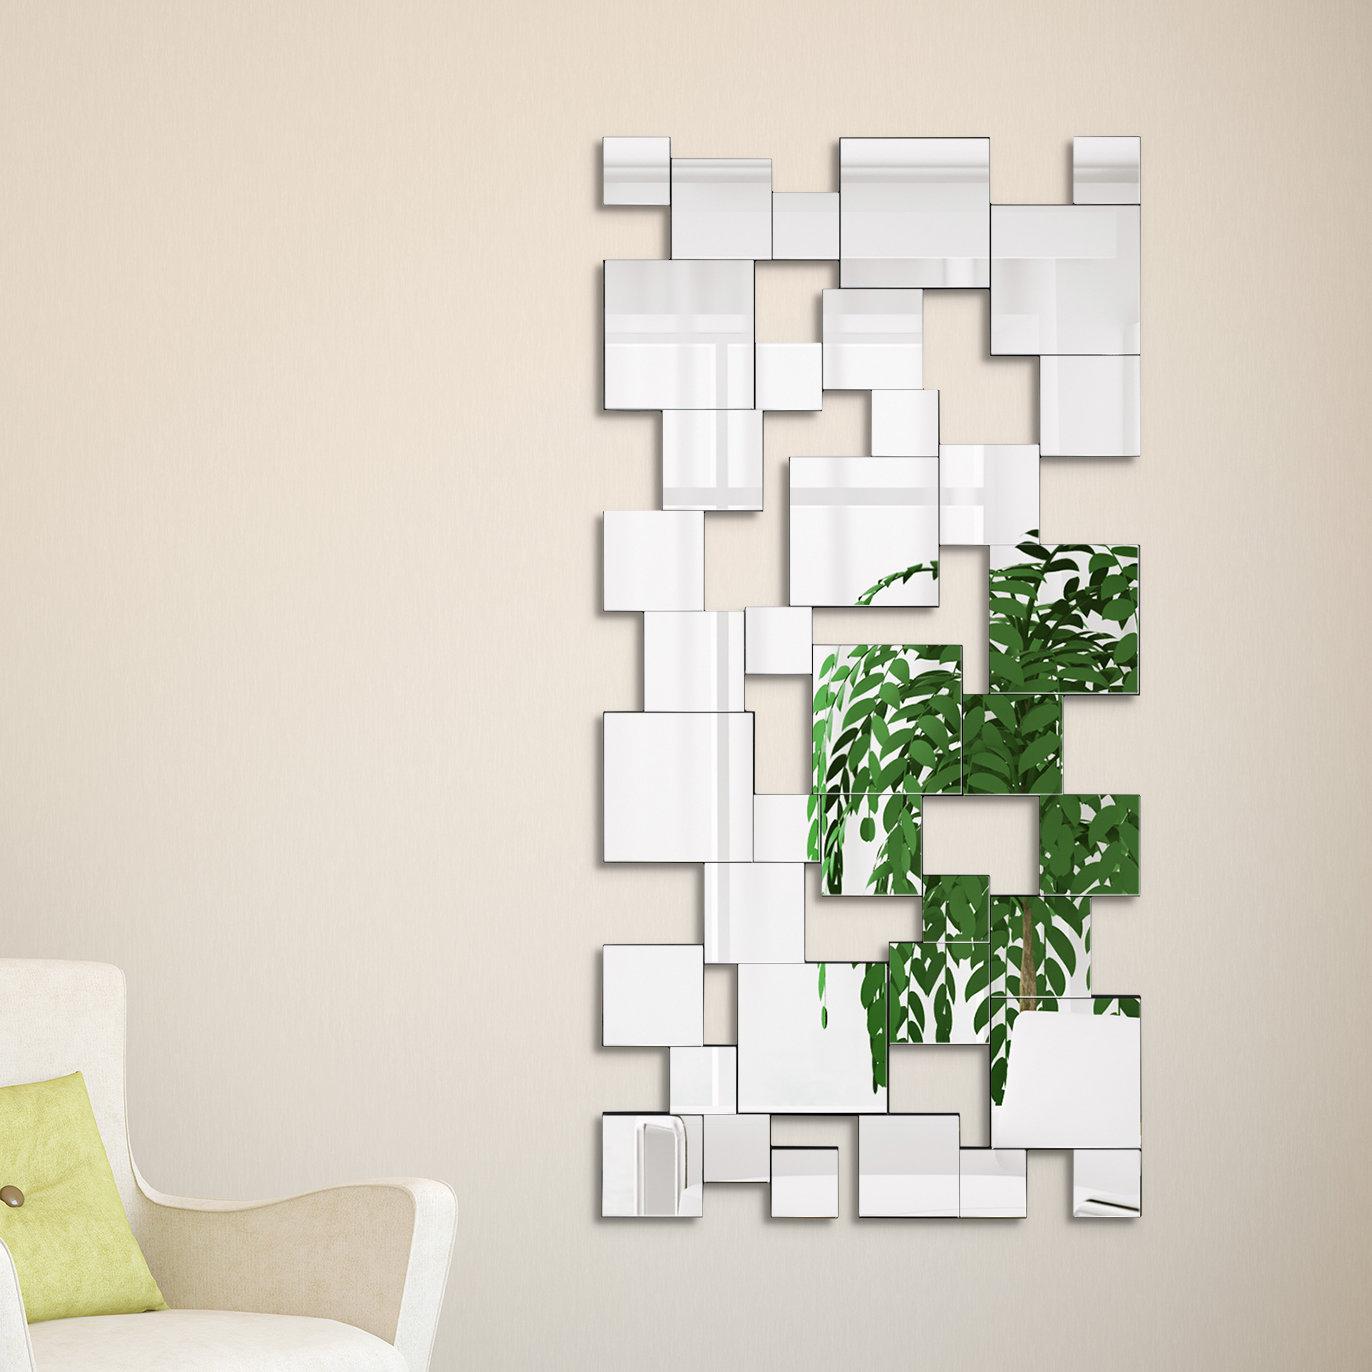 20 Ideas Of Rings Wall Decorwrought Studio Regarding Rings Wall Decor By Wrought Studio (View 3 of 30)